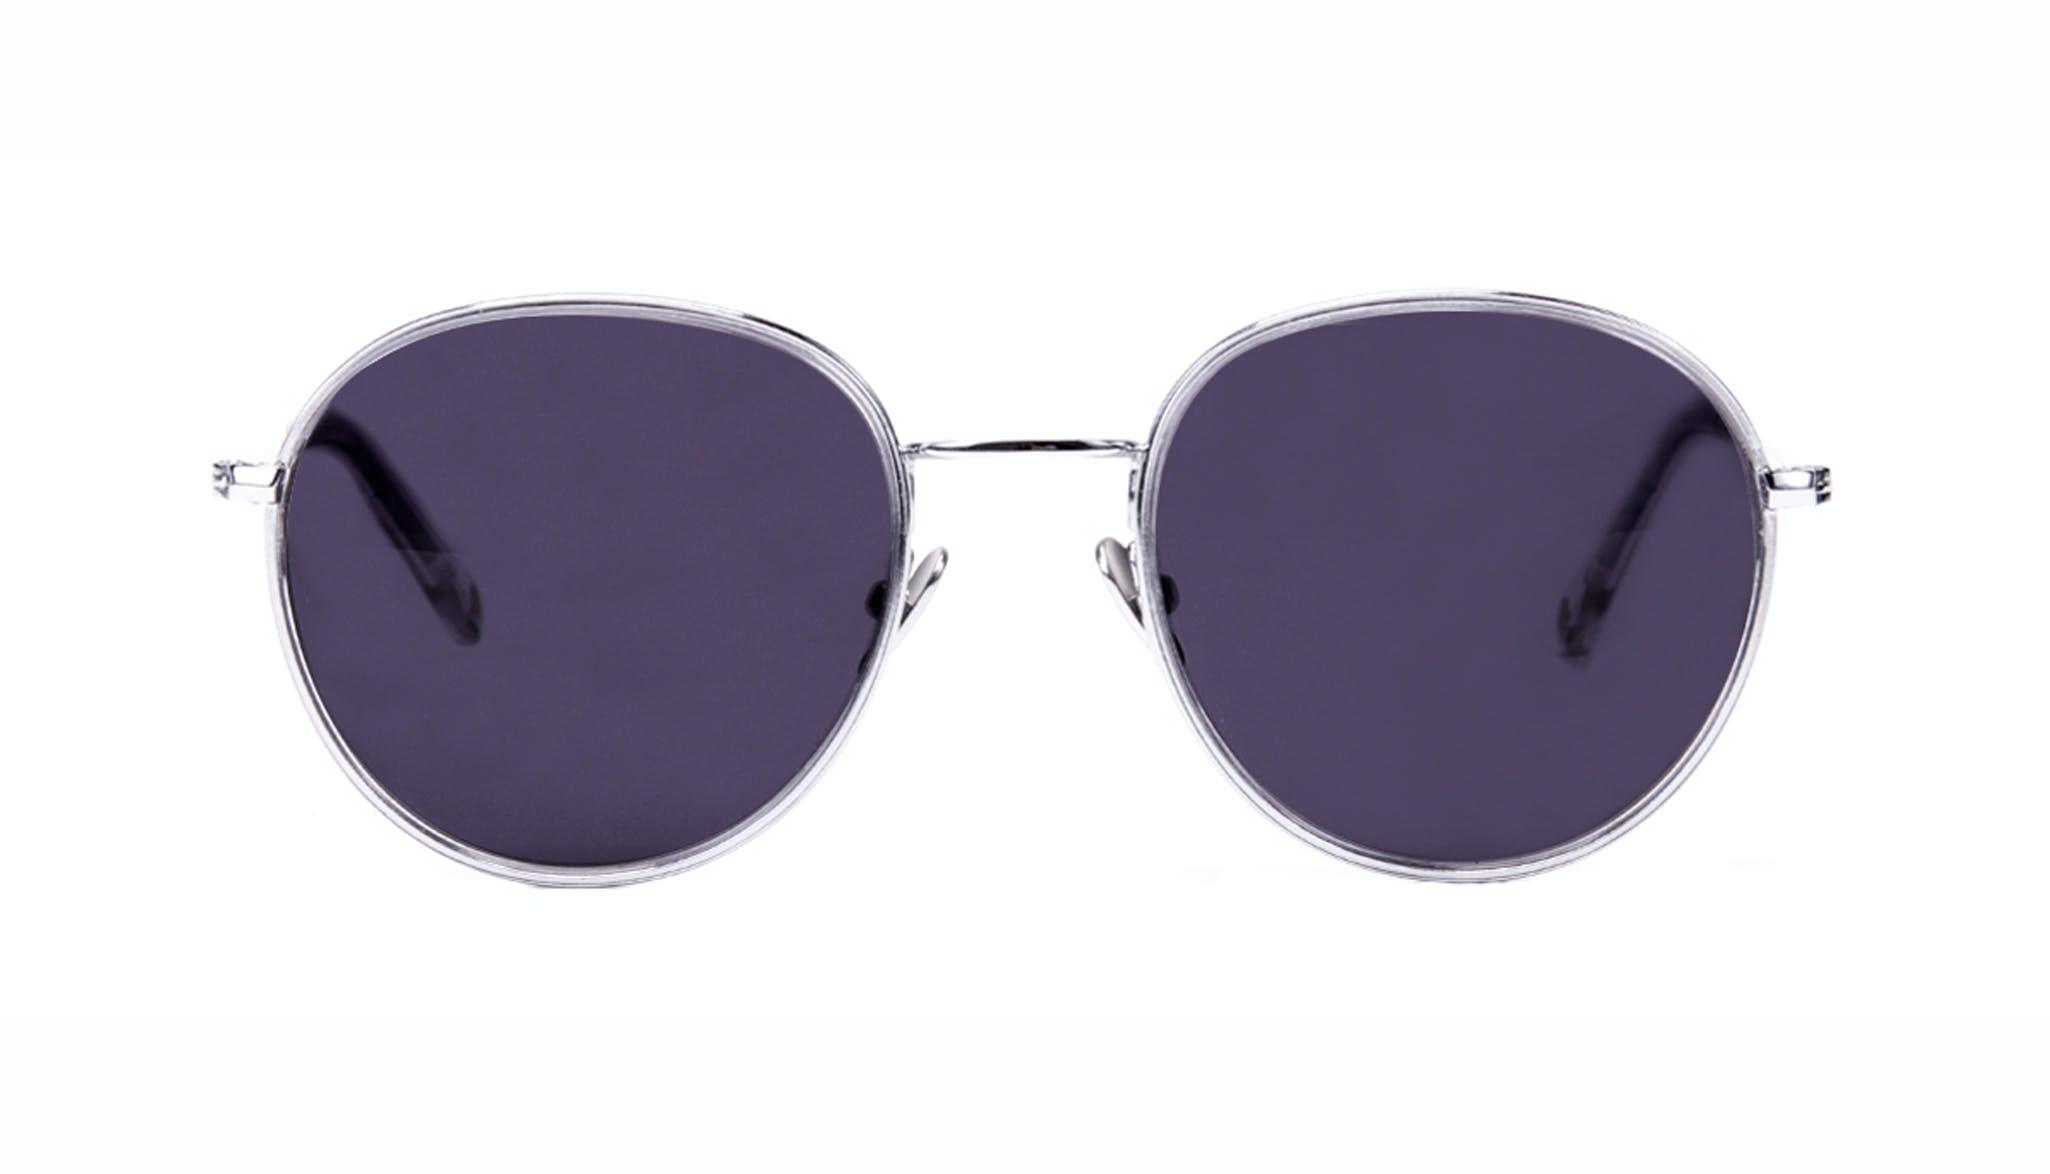 Affordable Fashion Glasses Aviator Round Sunglasses Women Subrosa Glacier Front